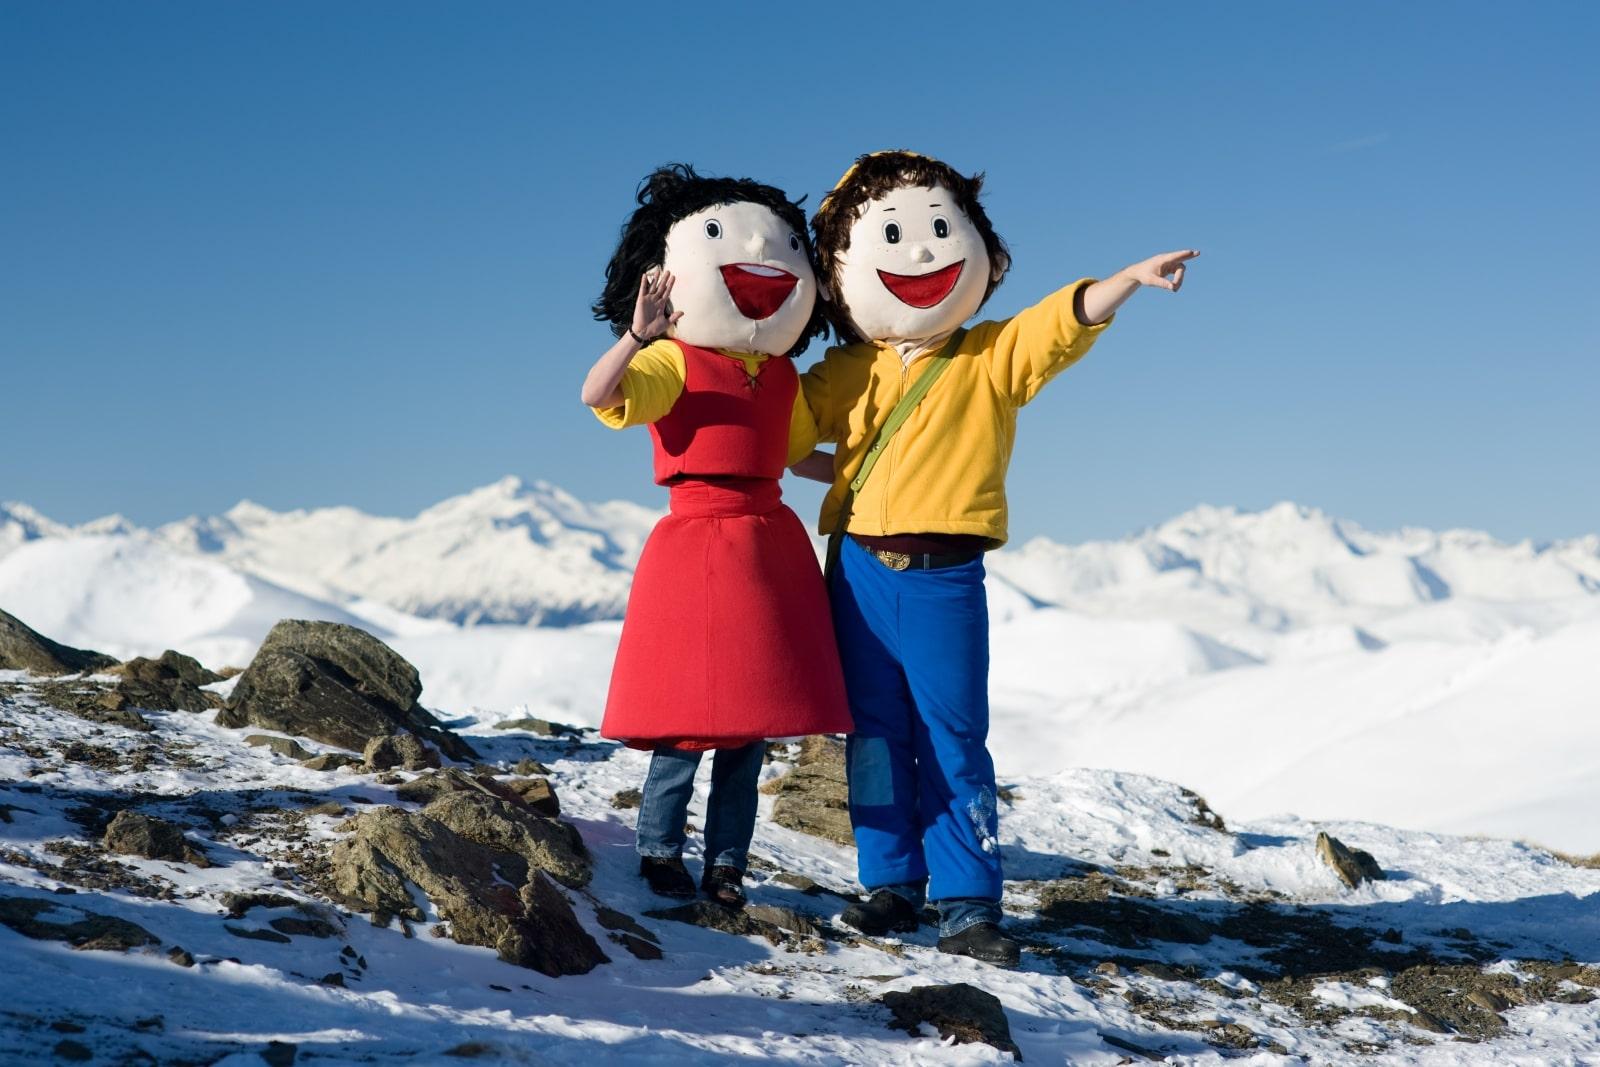 Heidi-Chalet-Falkert-Heidialm-Falkertsee-Ski-Heidi-und-Peter